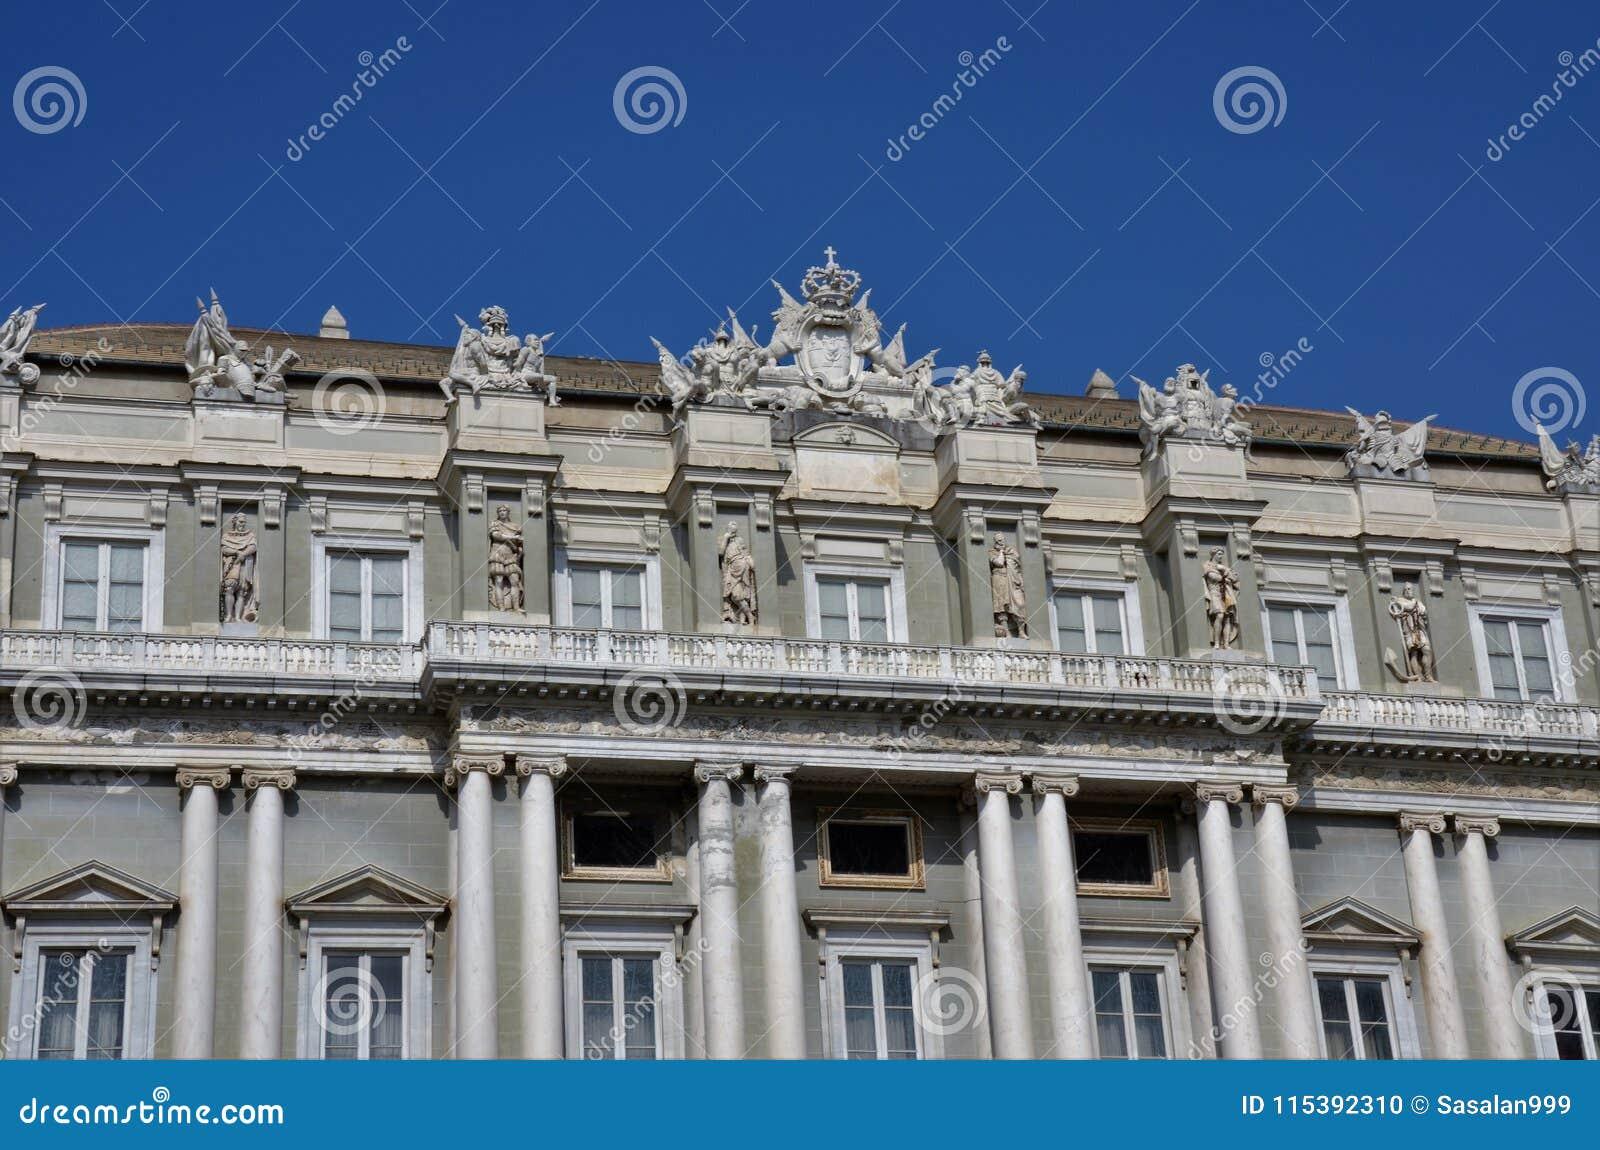 Palazzo Ducale Genoa - Genoa Landmarks